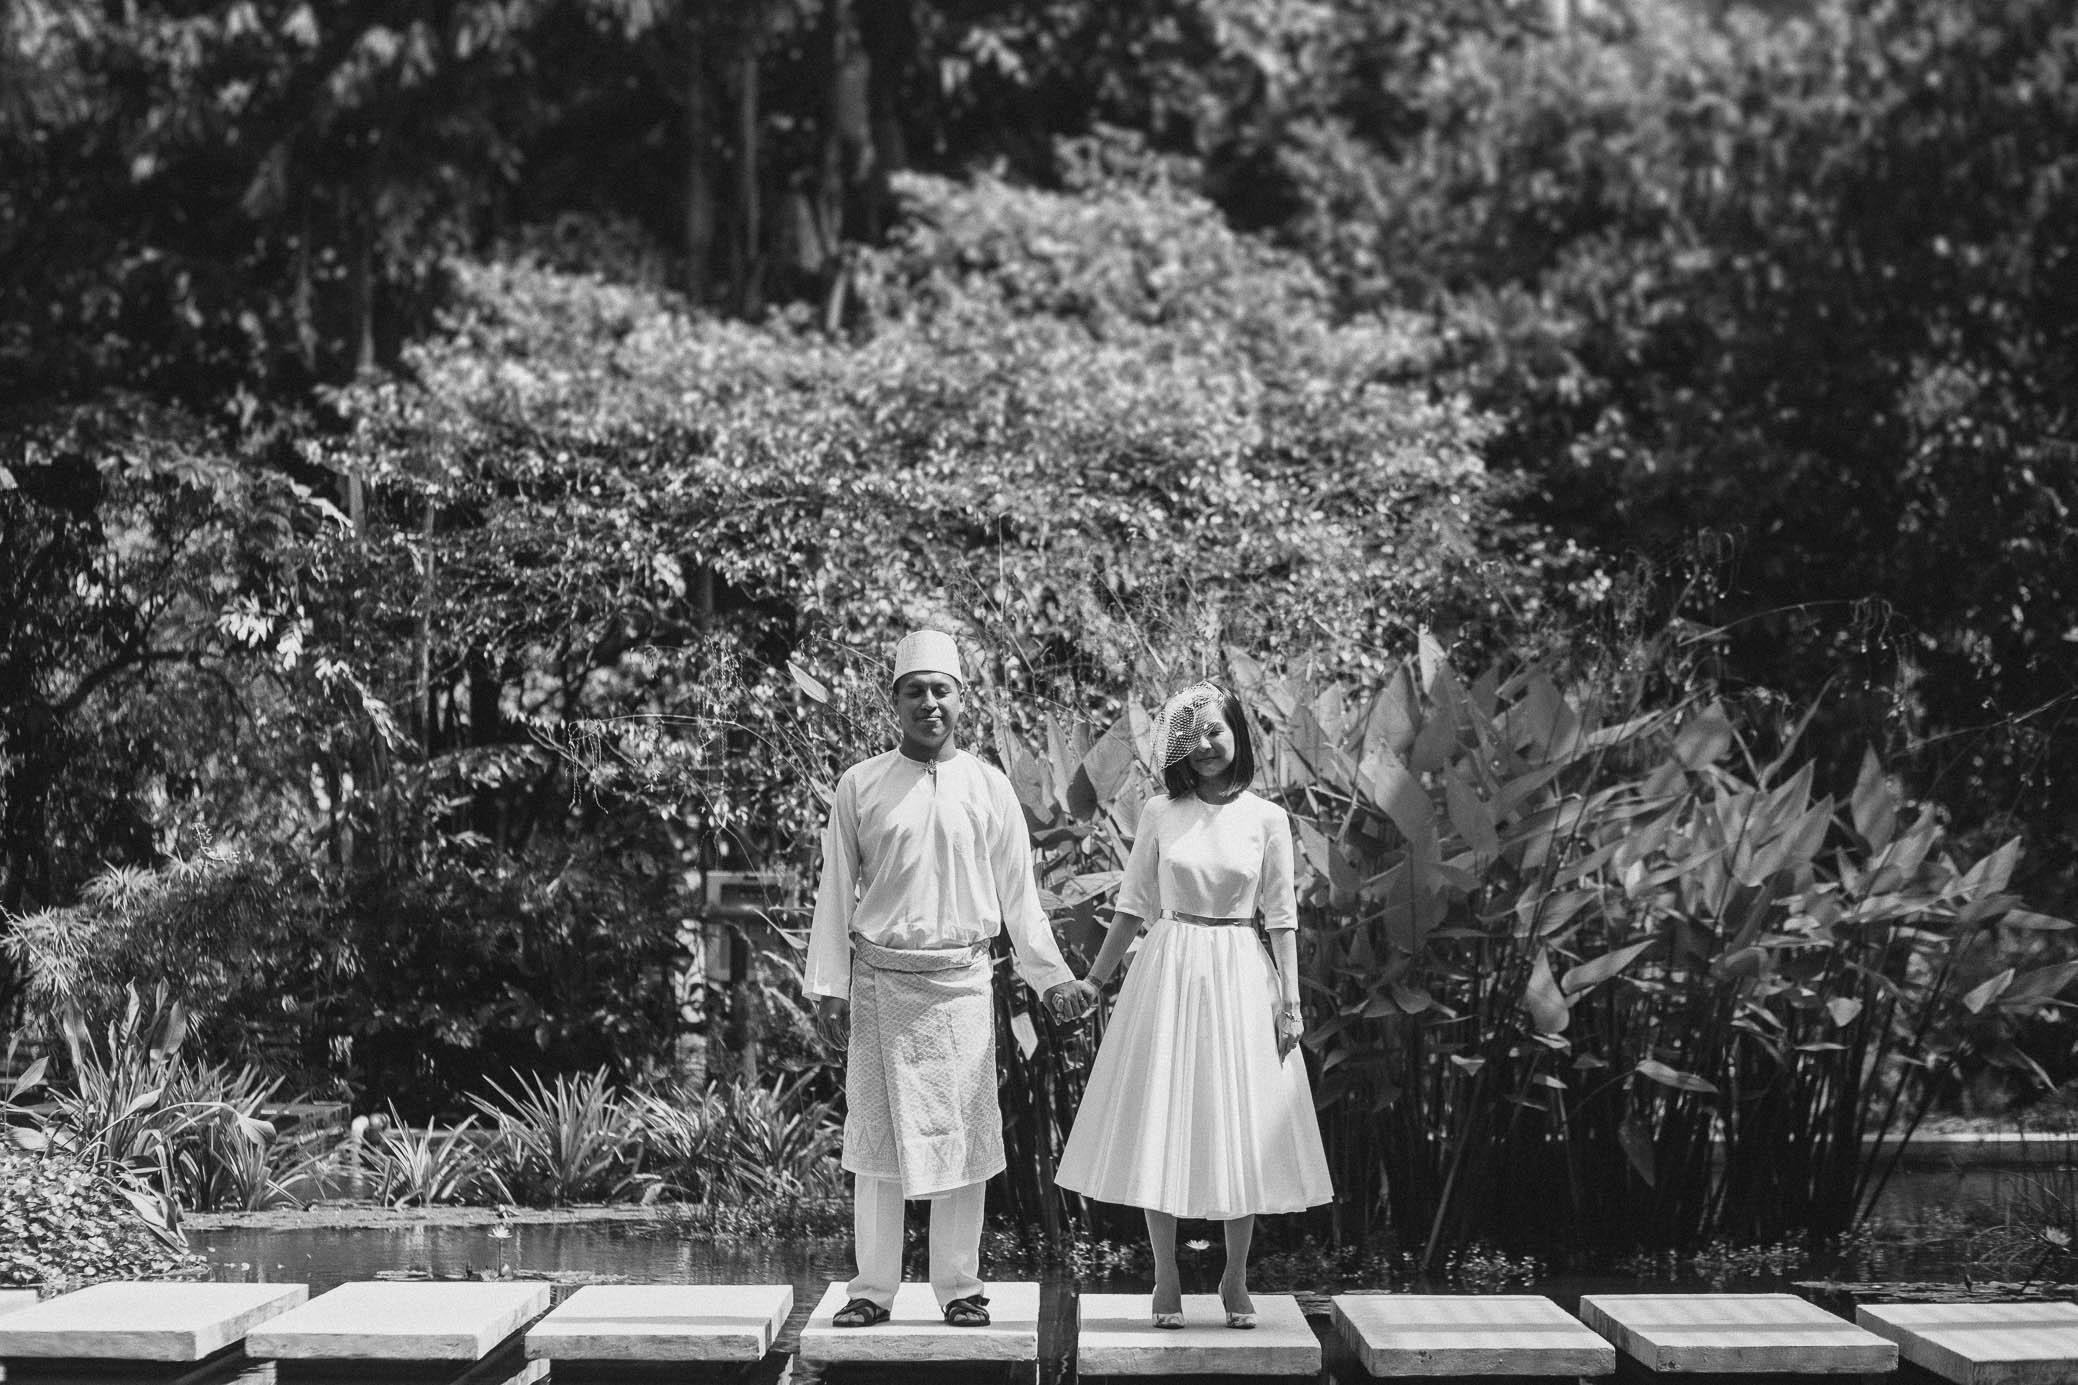 singapore-wedding-photographer-malay-indian-pre-wedding-travel-wmt-2015-alif-ethel-02.jpg